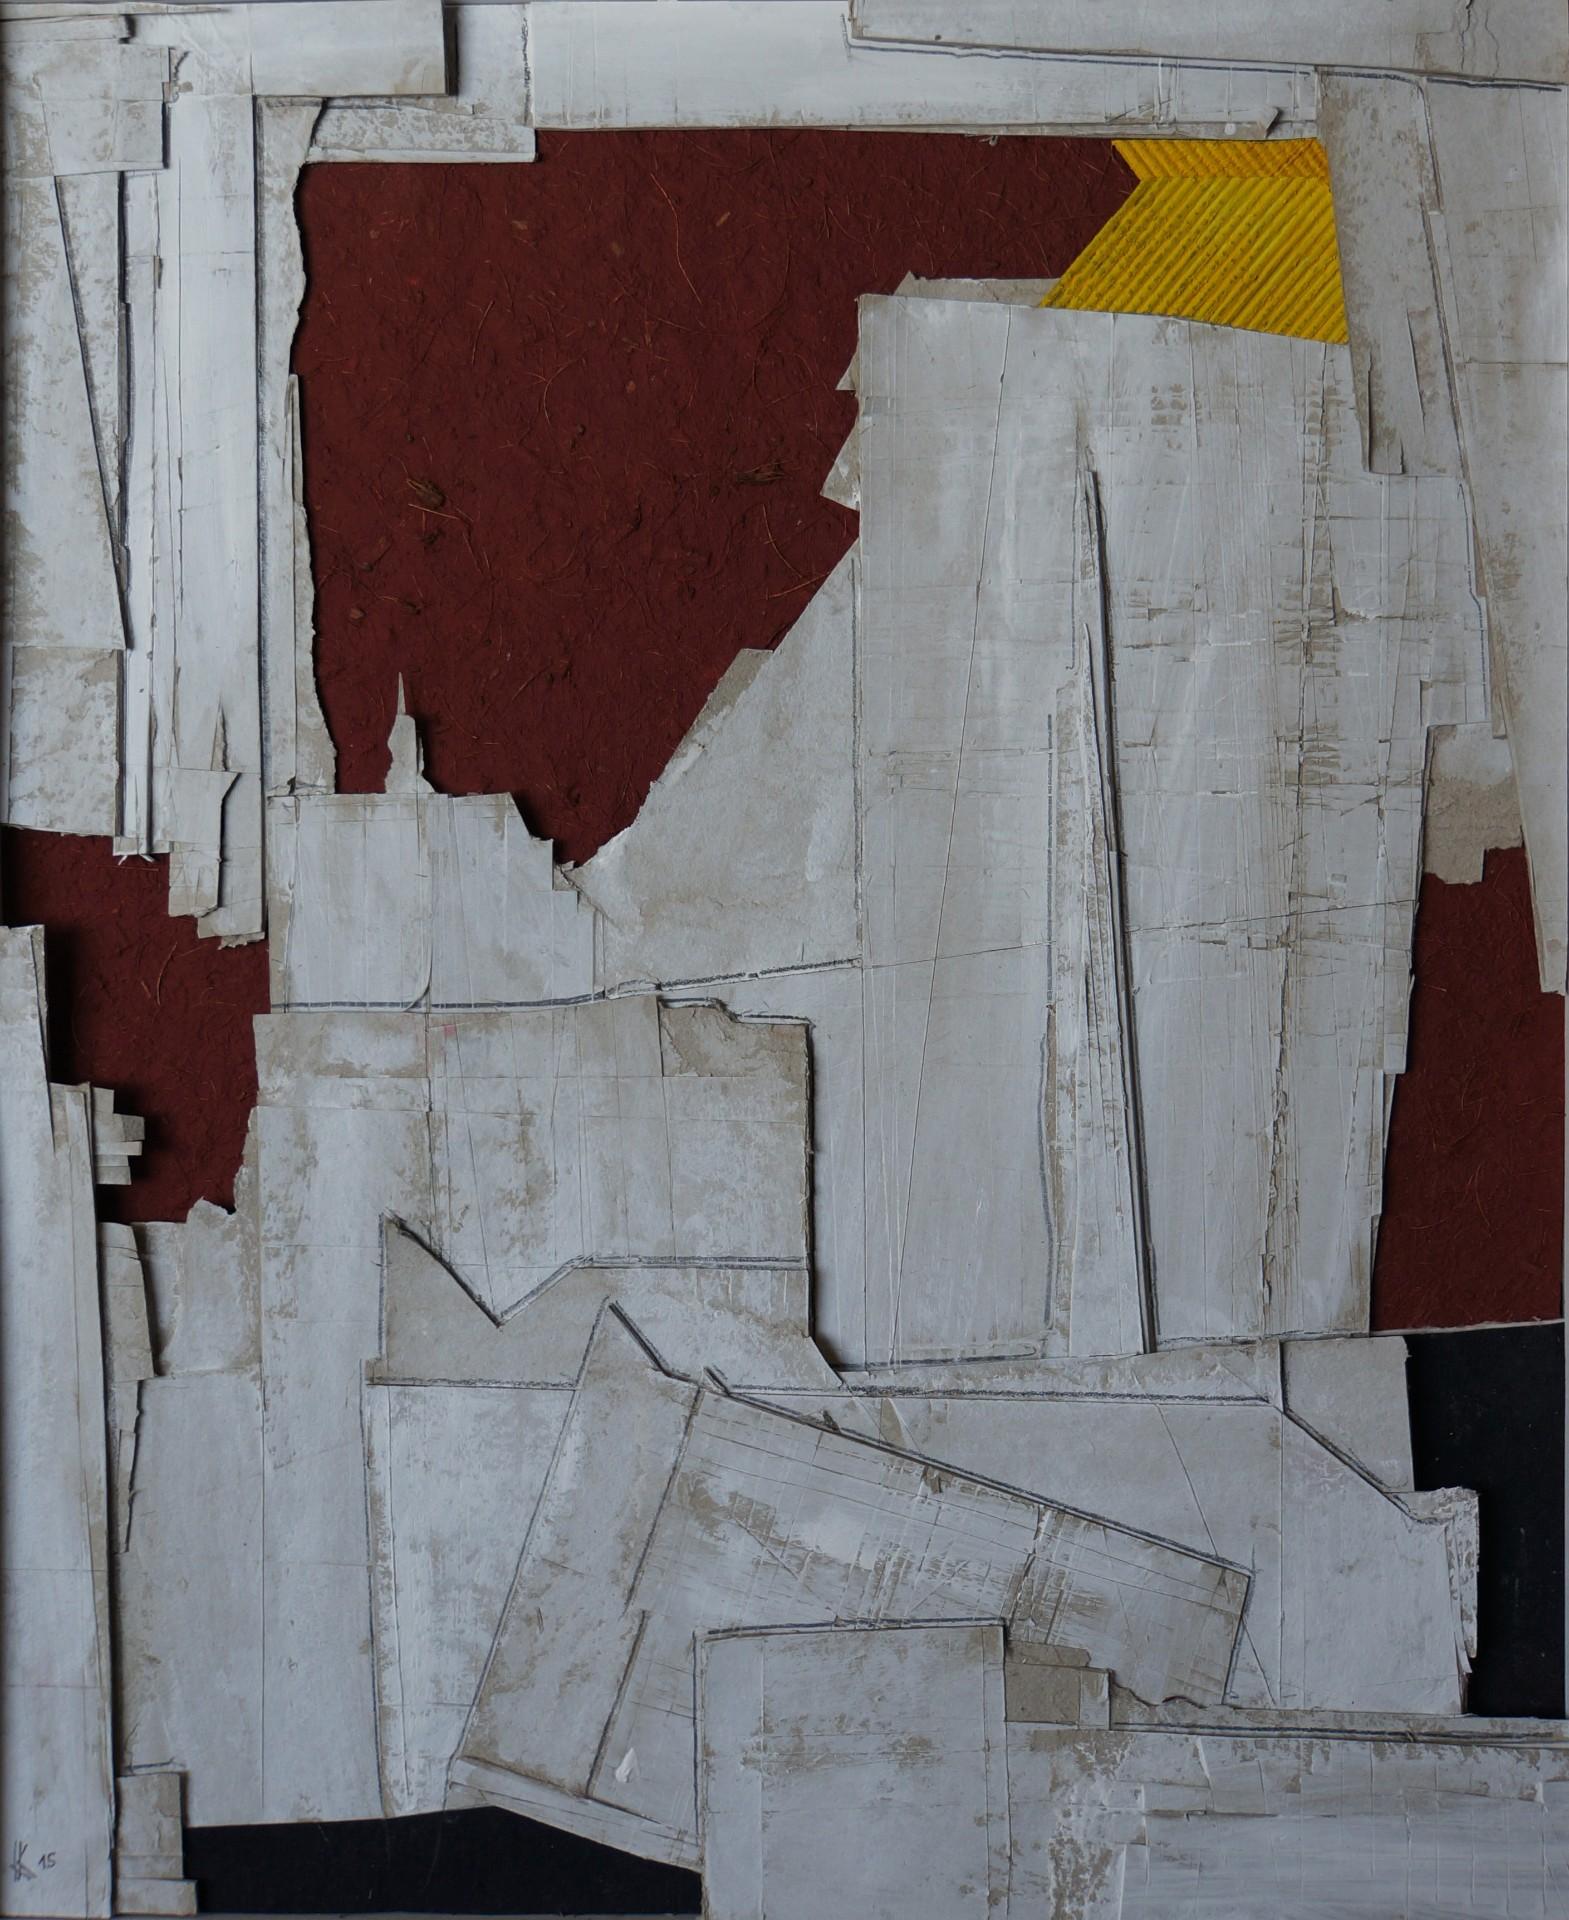 wodclockyui Leinwanddrucke 5 st/ück Sch/öne rote Rosen Malerei 5 Panel Leinwand Innenwand HD Kunstdekoration Gem/älde und Poster 200cmx100cm Rahmenlos